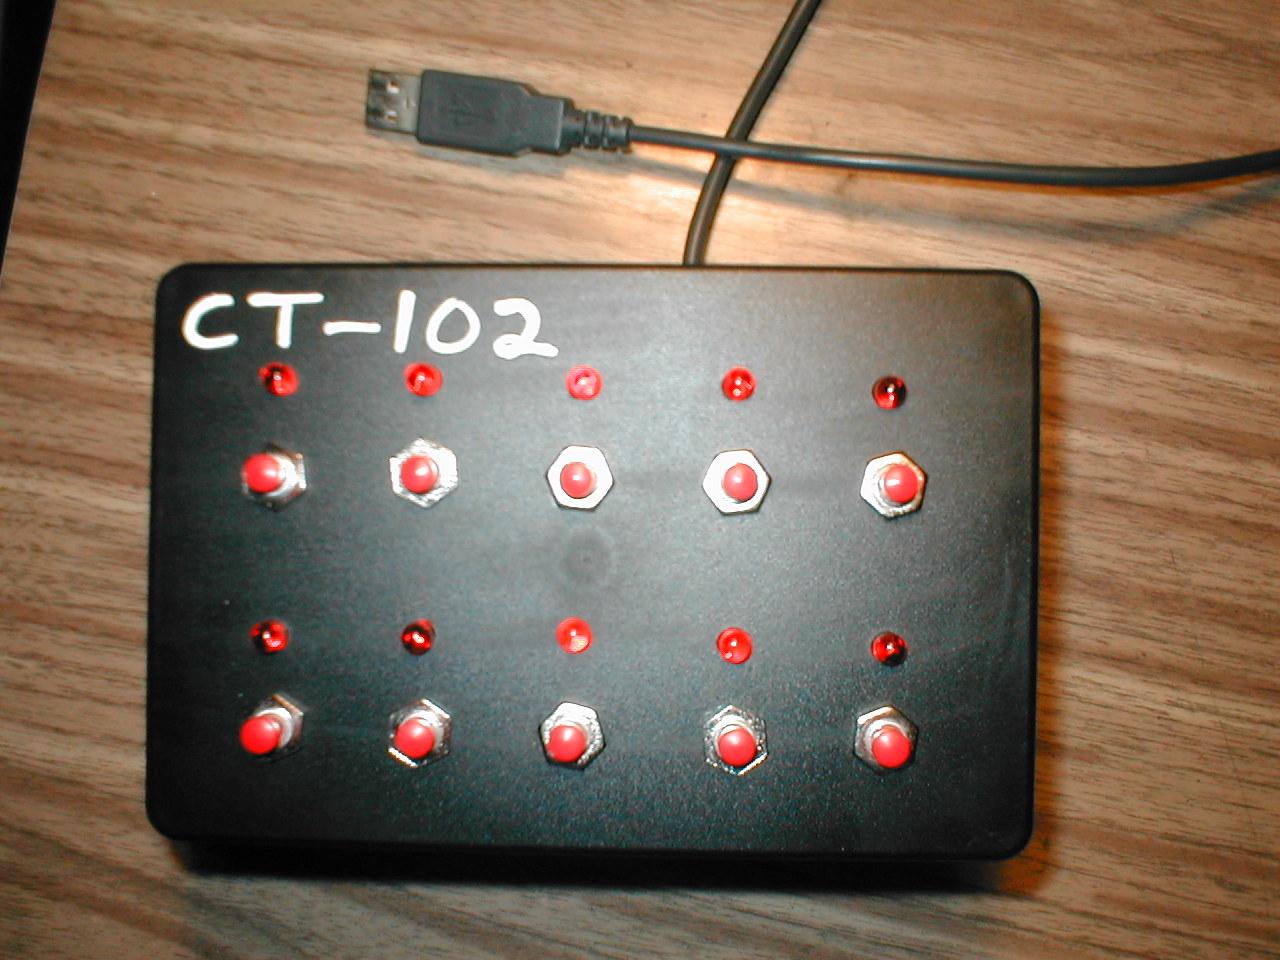 USB Midi Device from old Gamepad